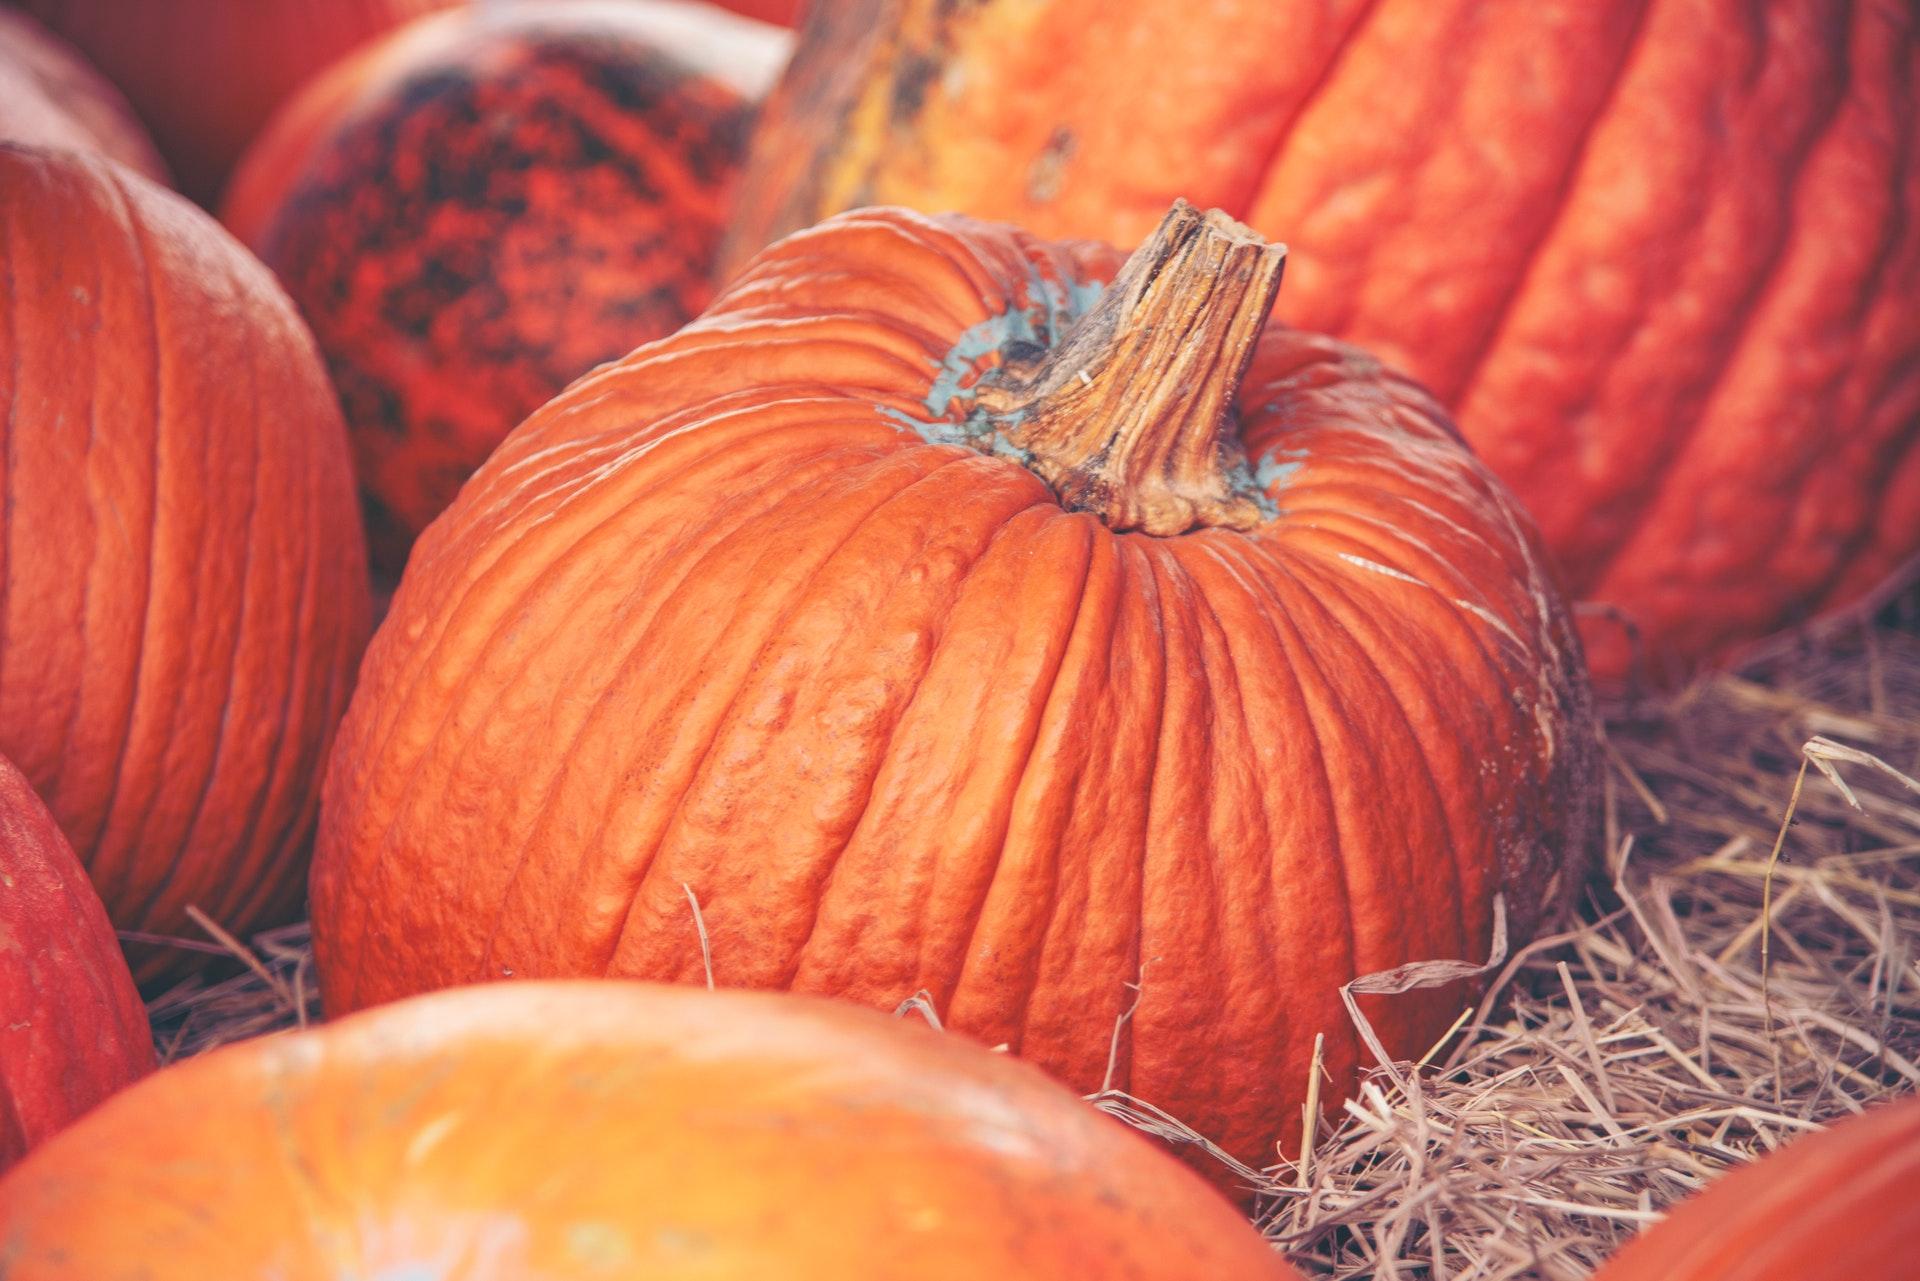 Photo of Large Pumpkins in Hay